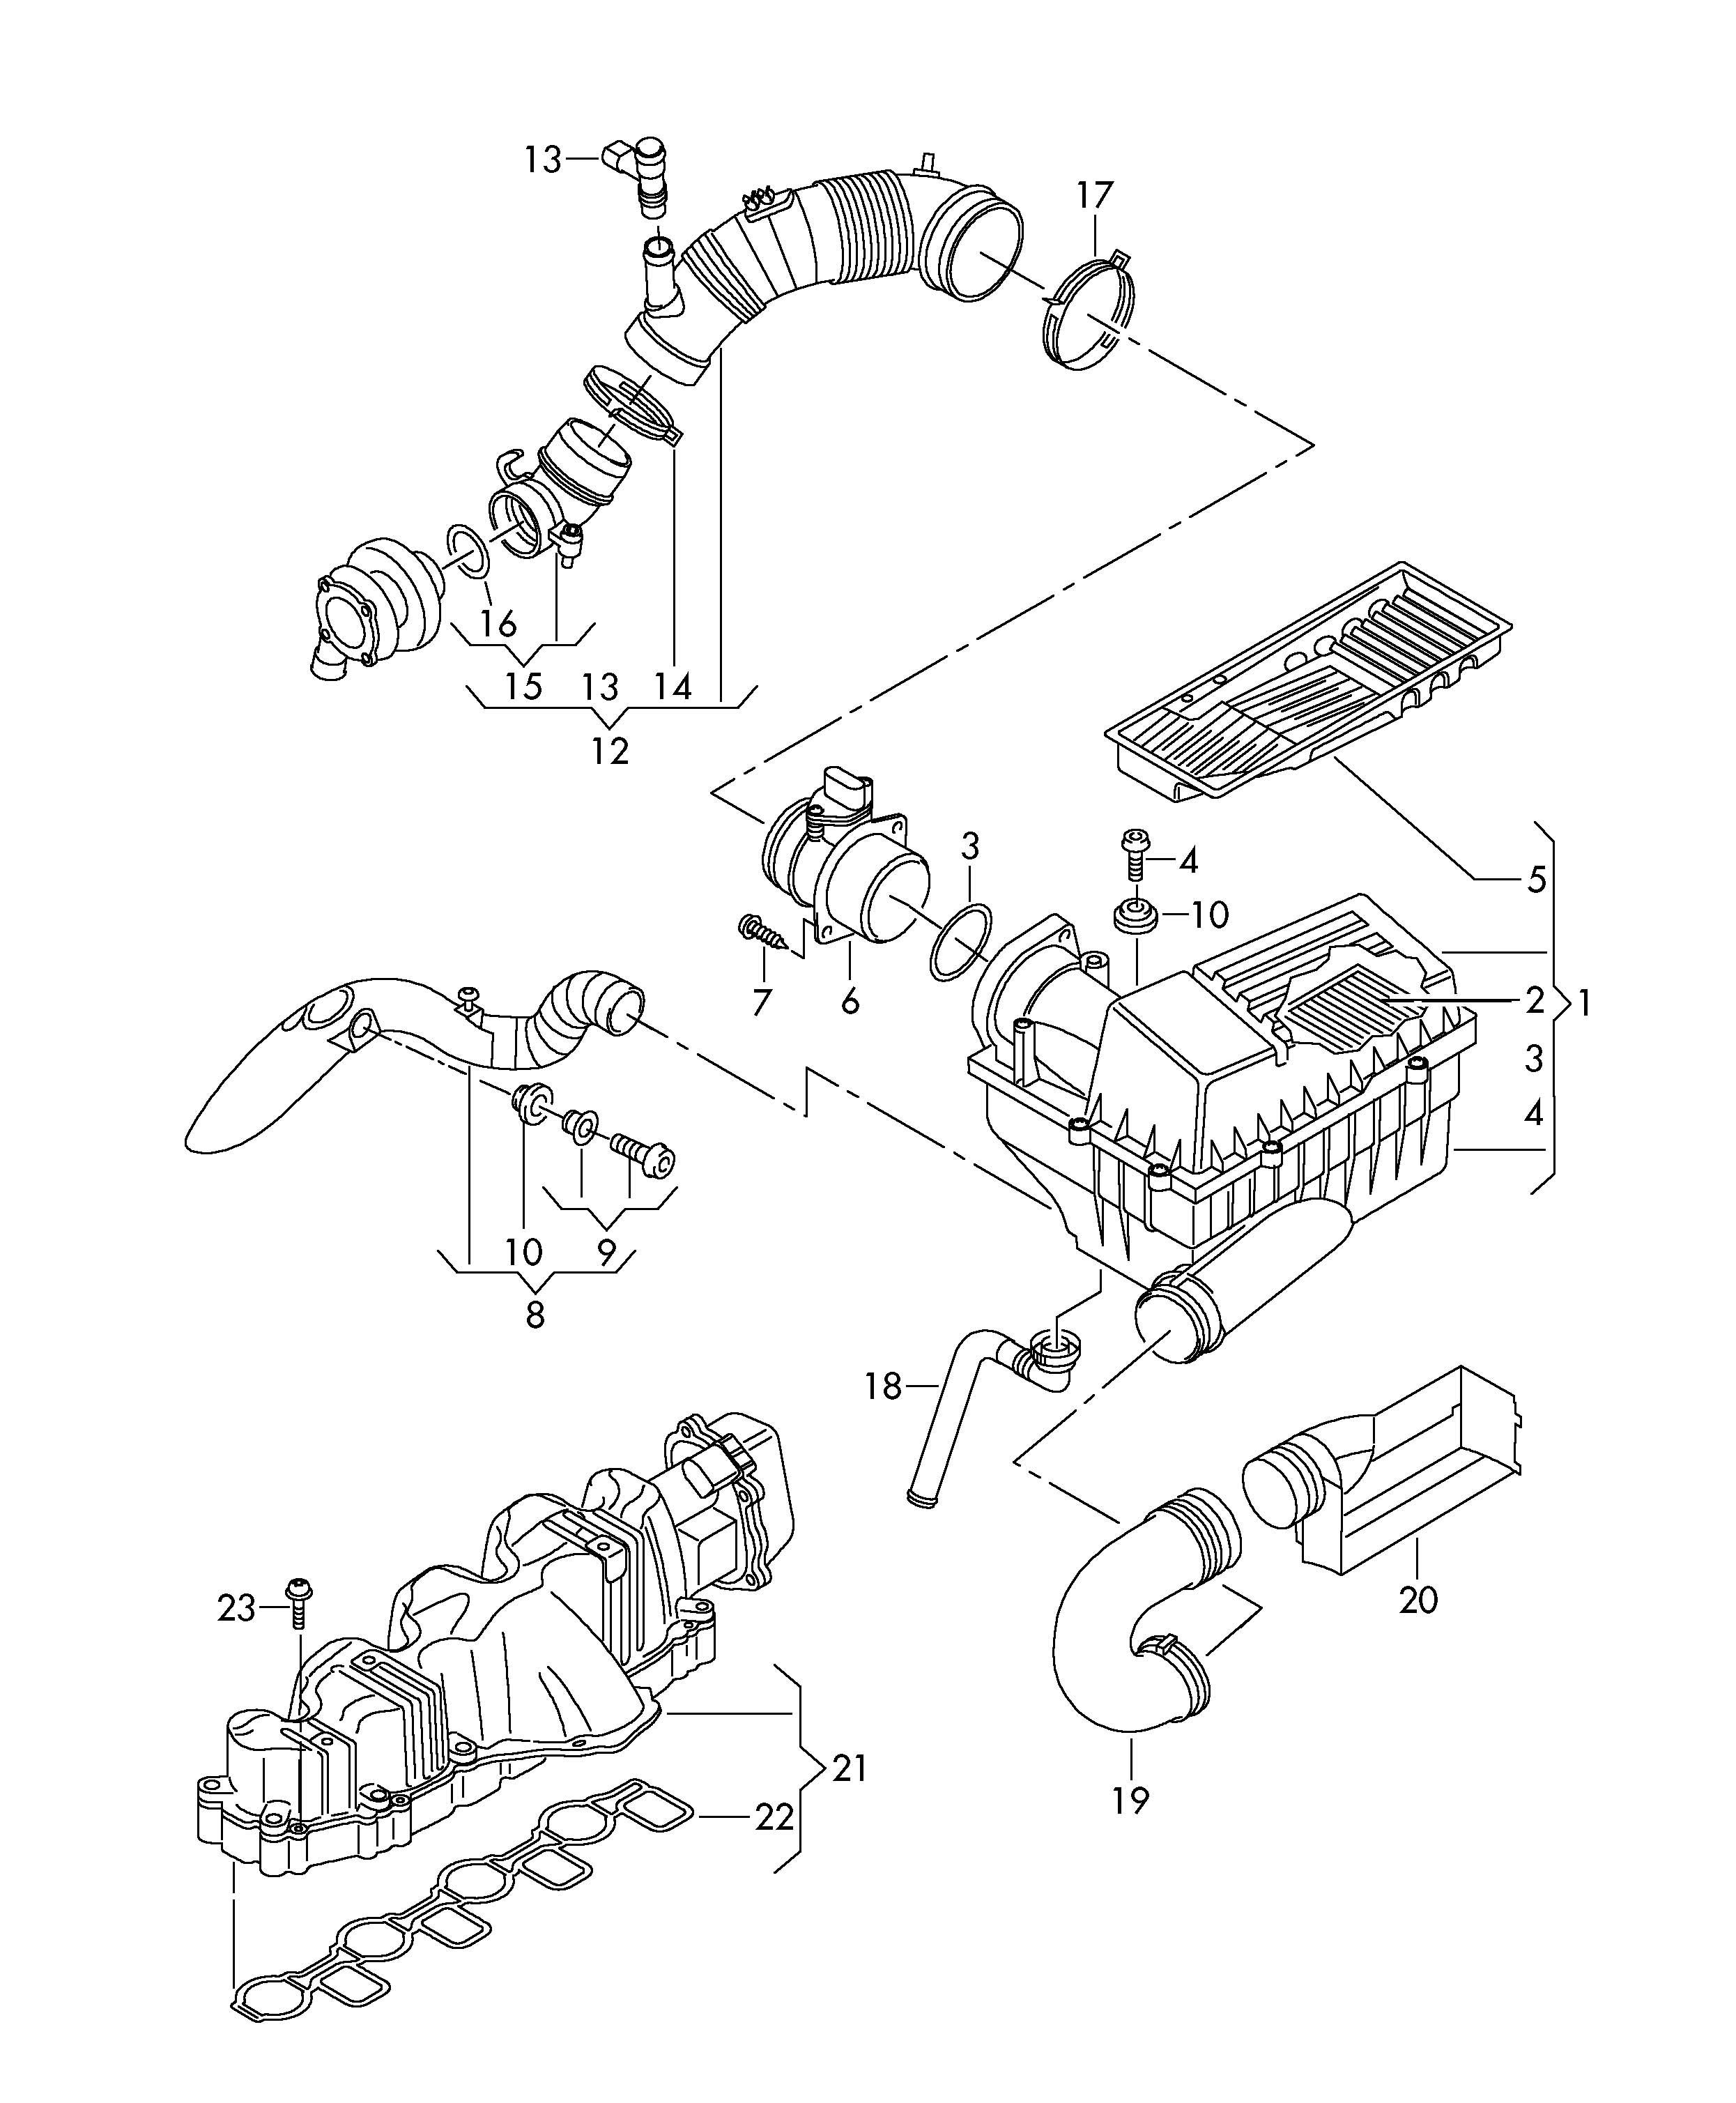 Volkswagen Golf Intake Manifold Cbab Cbaacbab Cbaa